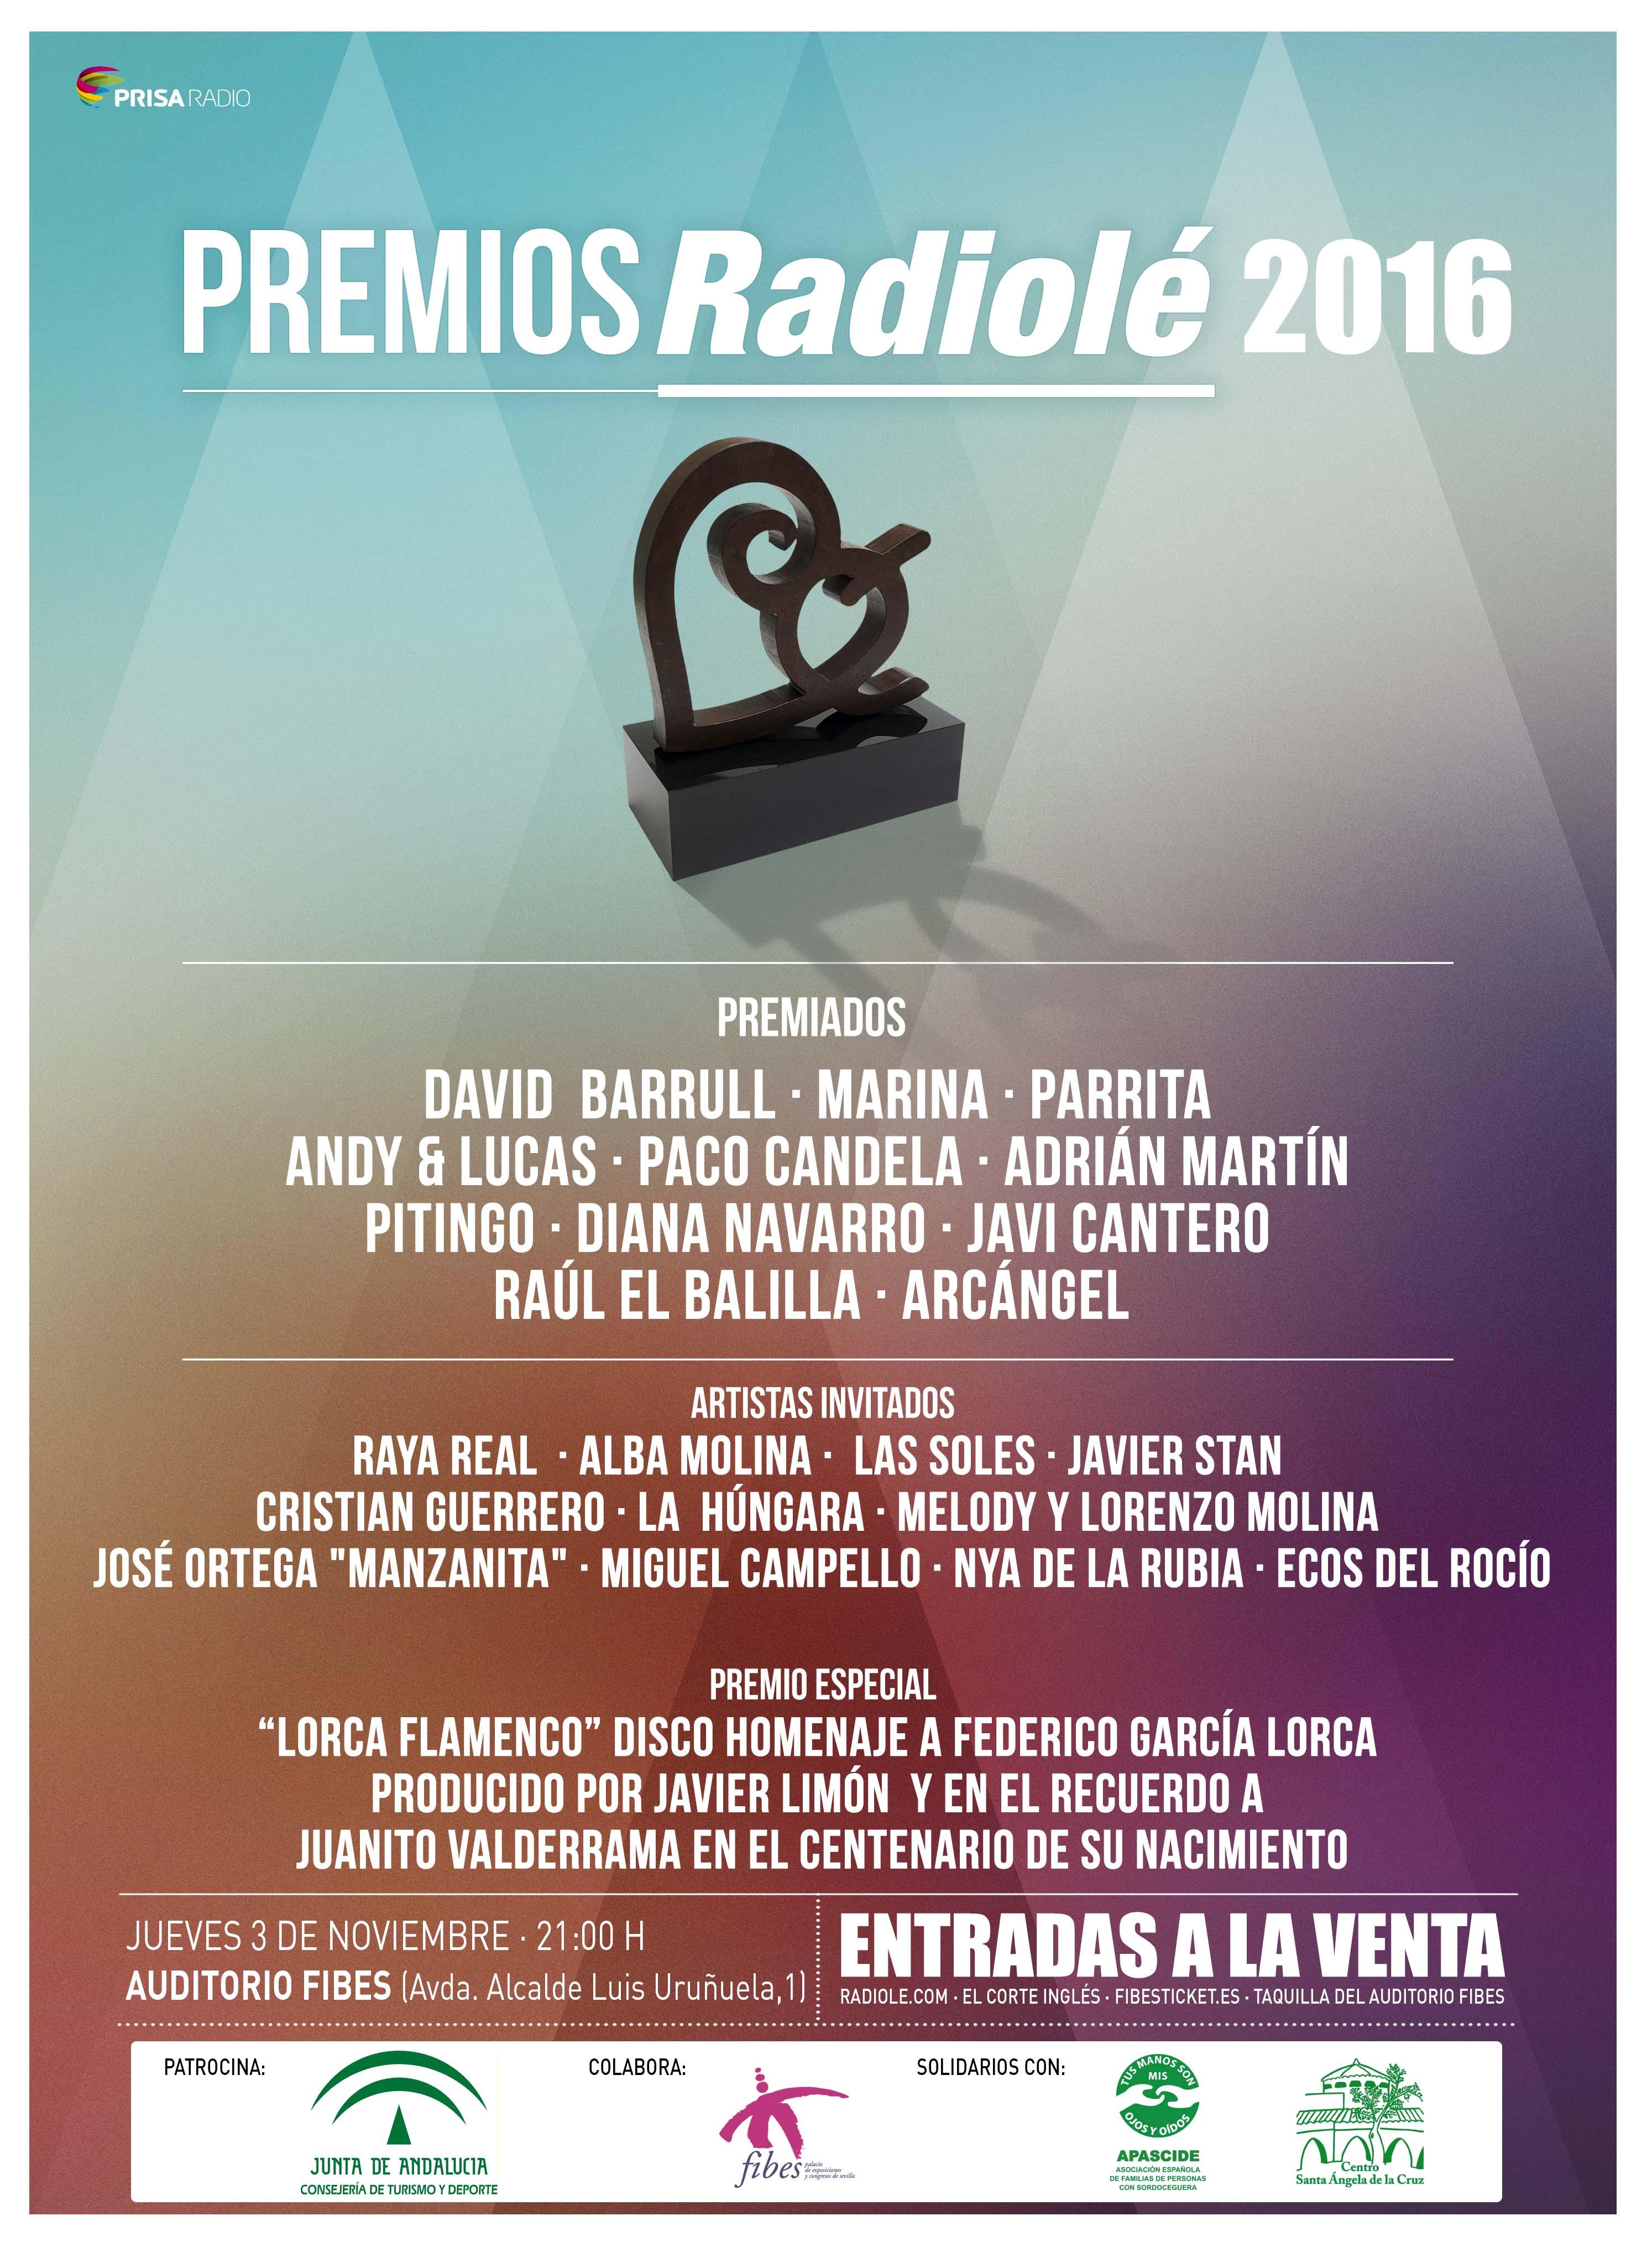 premiosradiole_2016_redes